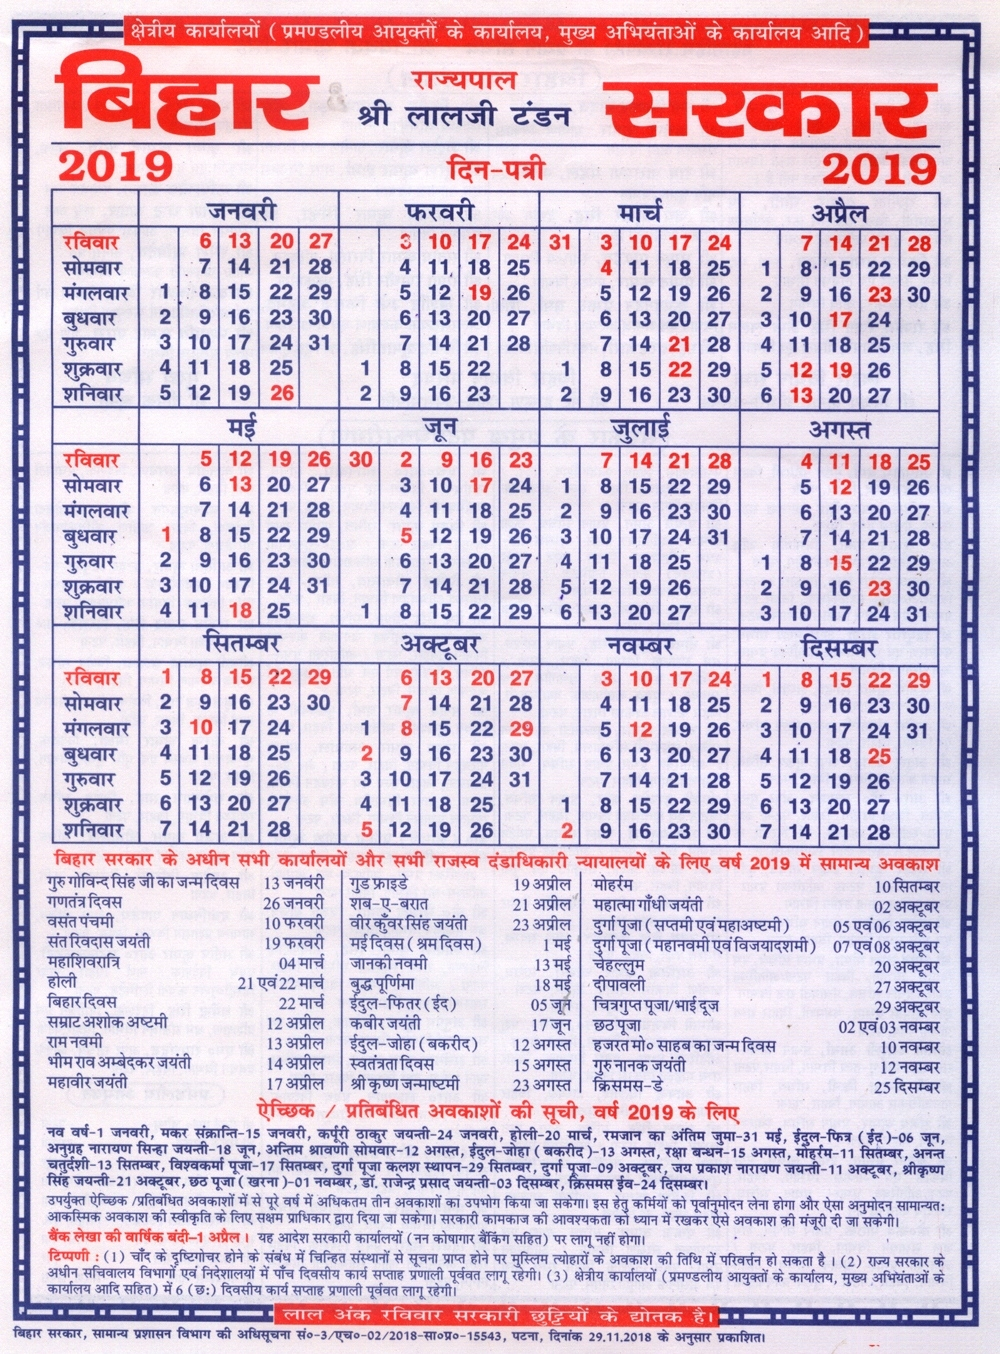 Download Bihar Sarkar Calendar 2020 | Calendar For Planning Bihar Sarkar Calendar 2021